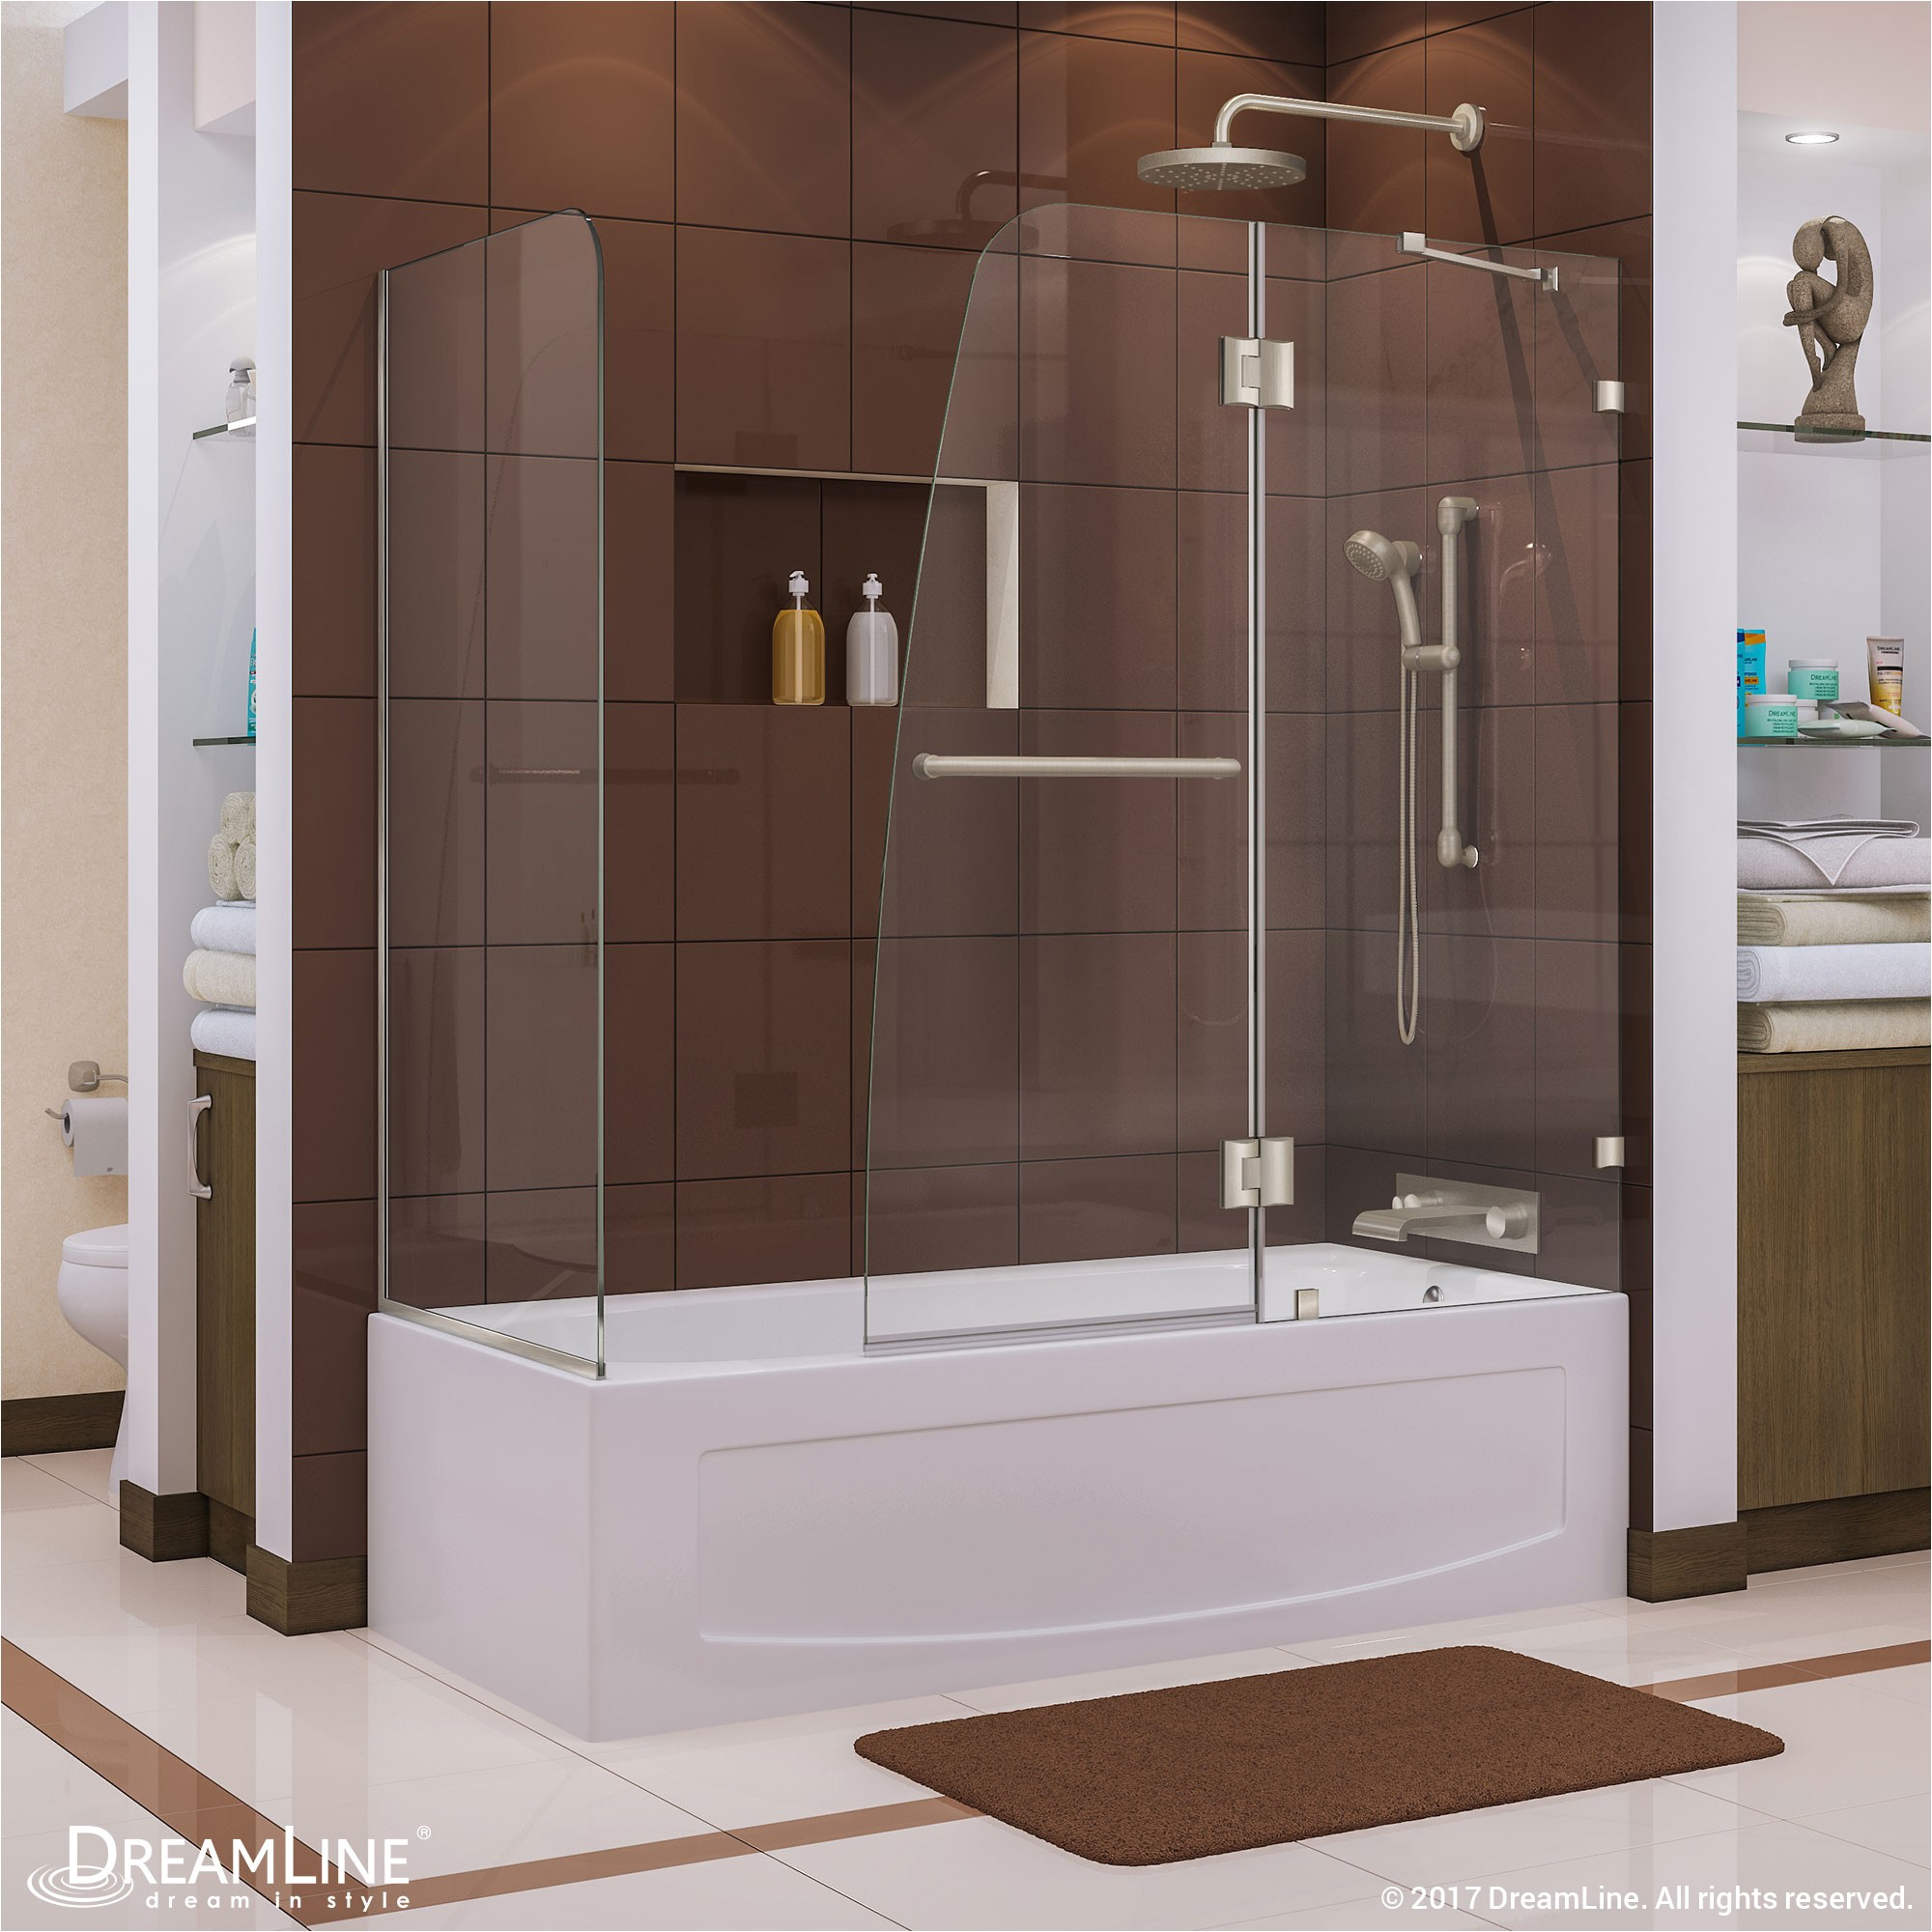 Dreamline Shower Doors Reviews Dreamline Aqua Lux 60 Quot X 58 Quot Hinged Tub Door Reviews